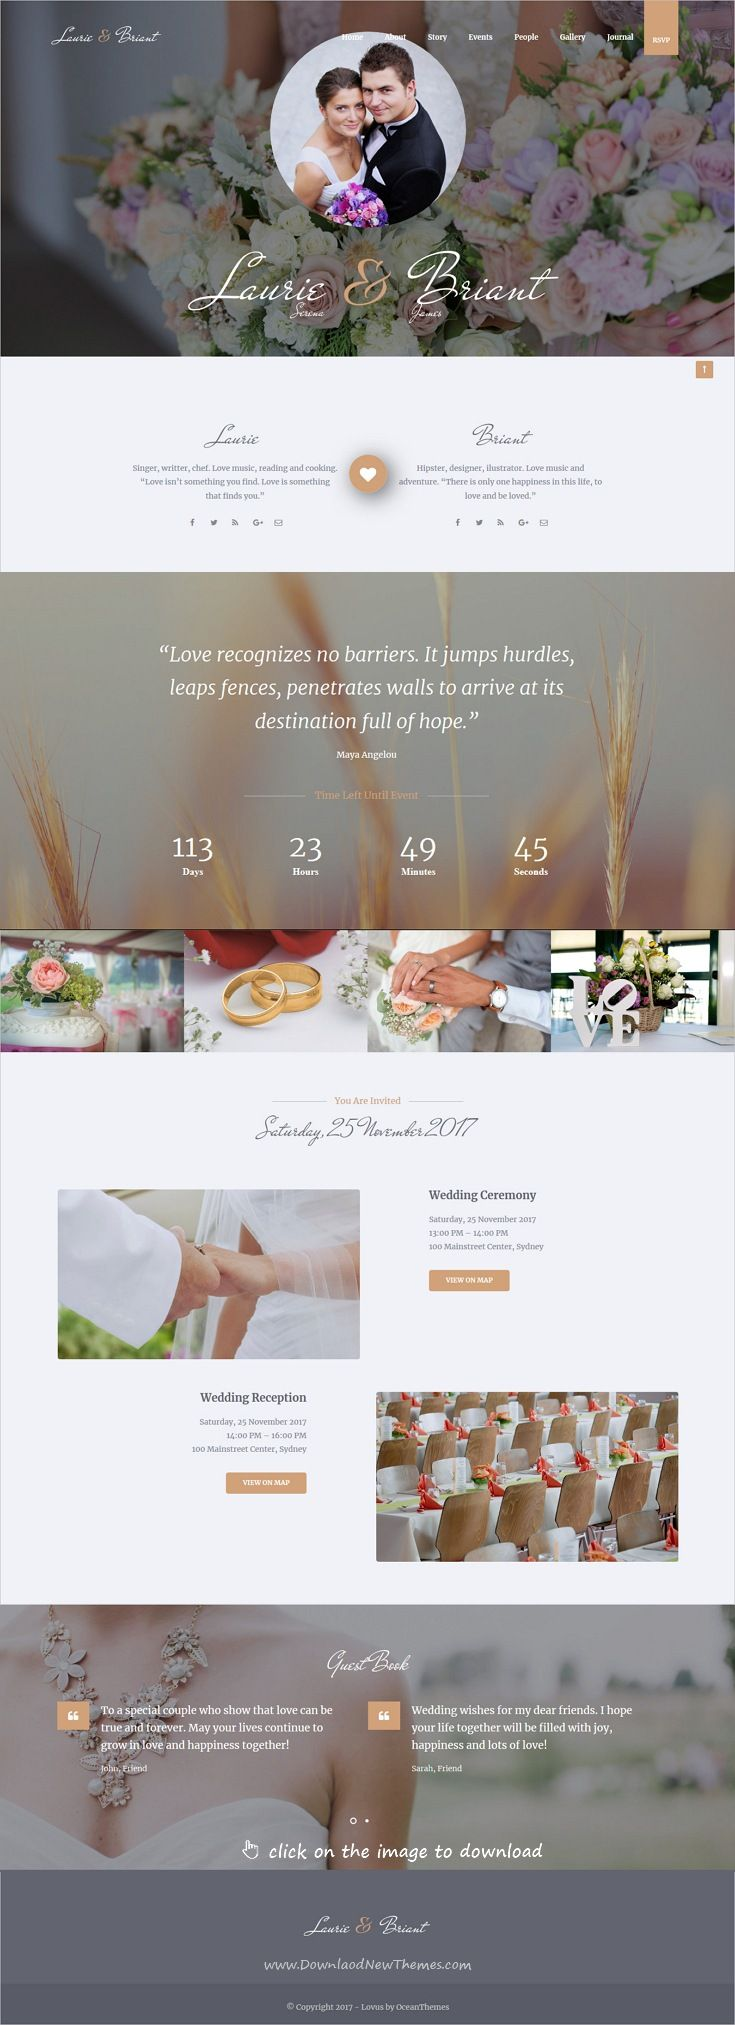 Lovus Wedding Planner WordPress Theme Web Design Inspiration And